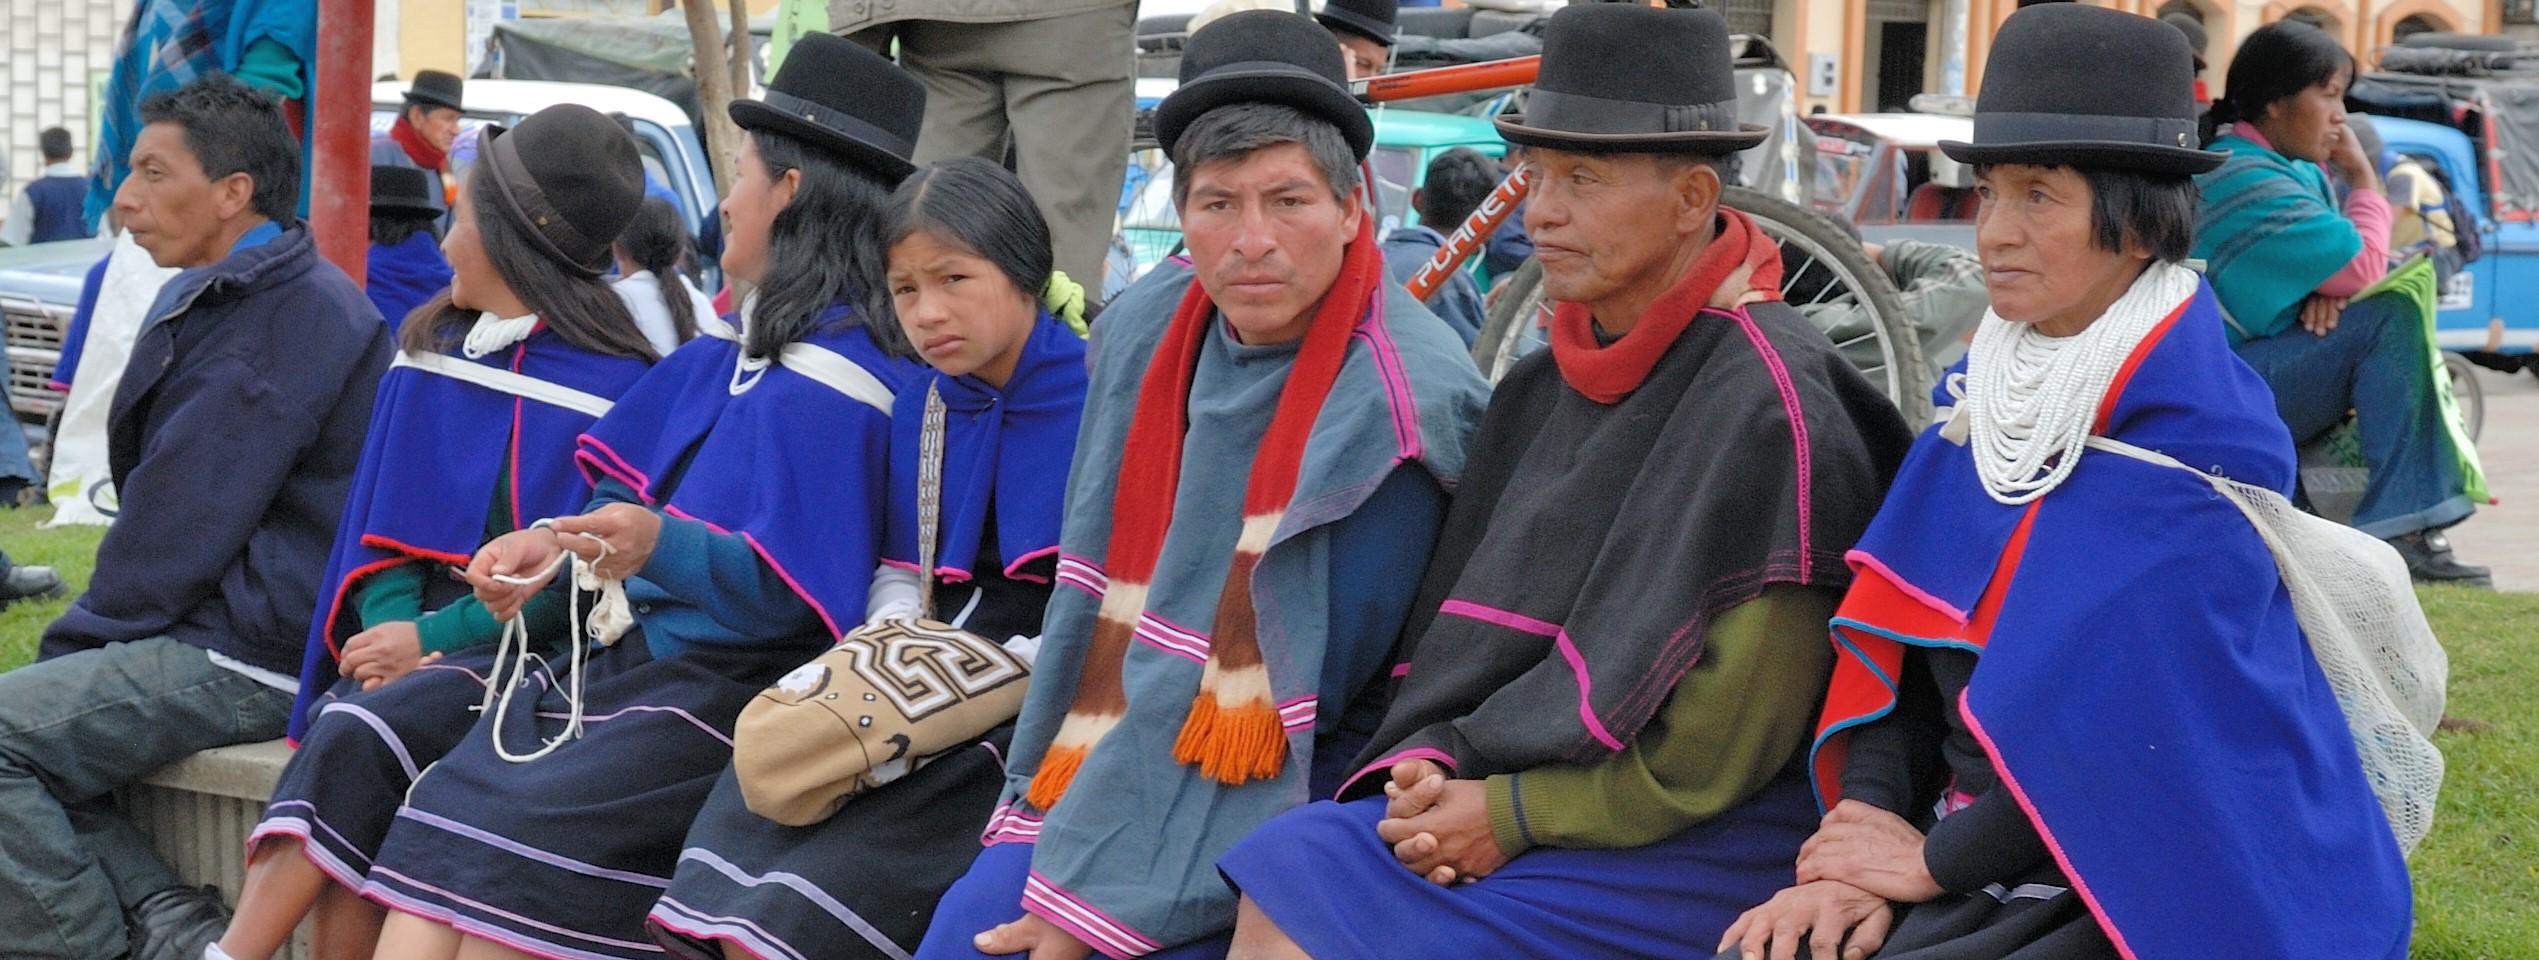 https://www.kontour-travel.com/wp-content/uploads/popayan-silvia-colombia-markt-004-2.jpg